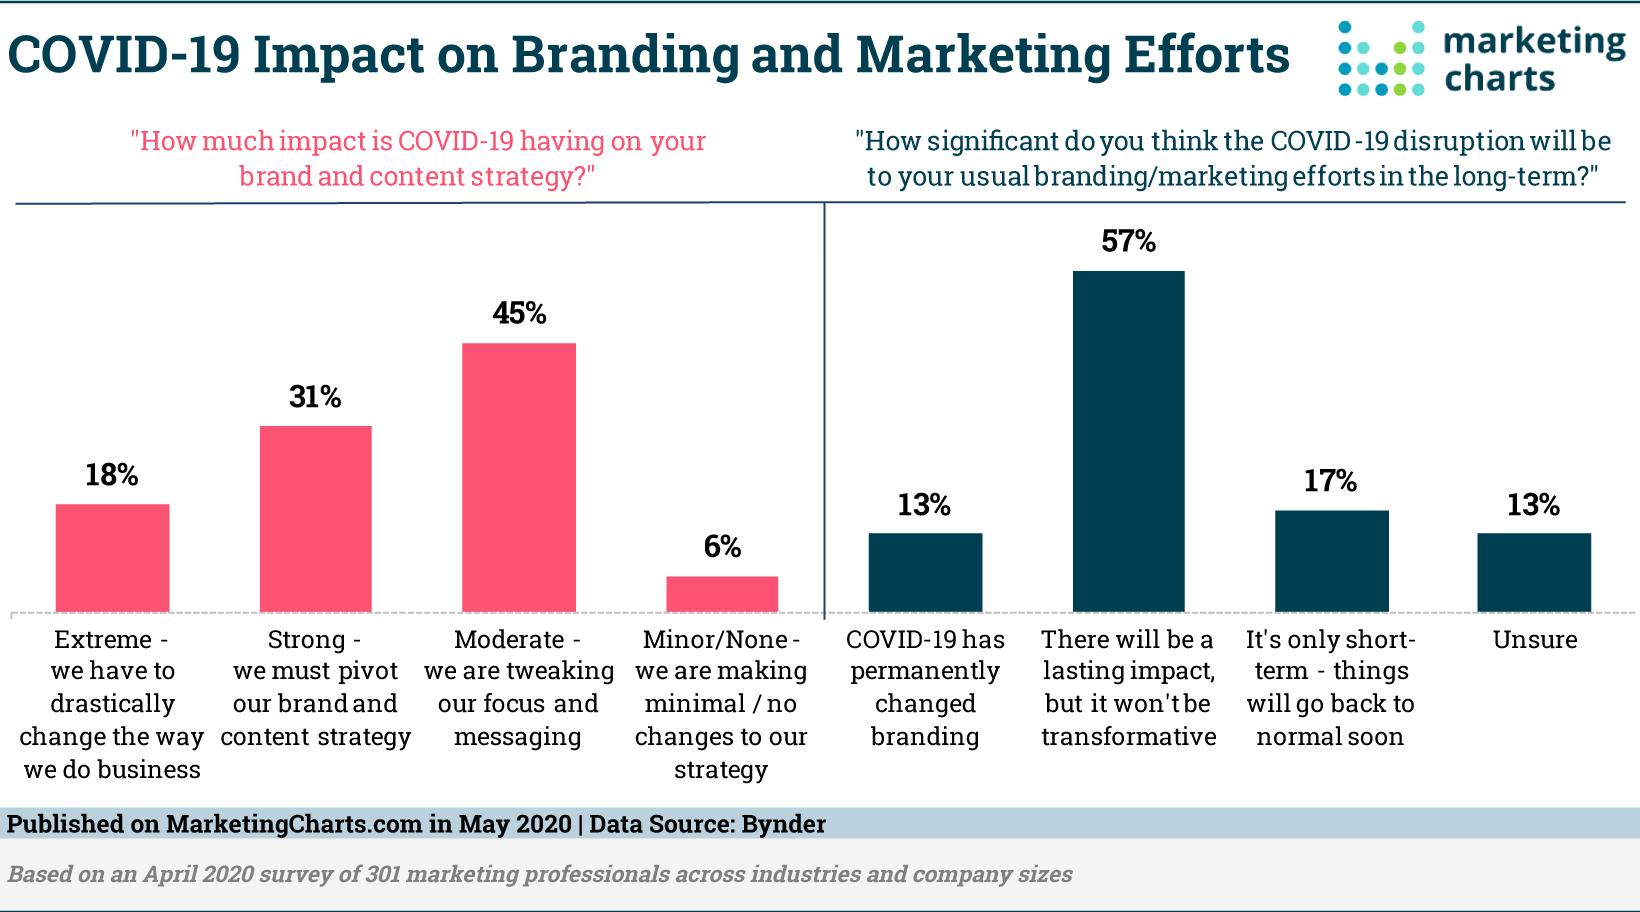 Bynder-COVID-19-Impact-Branding-Marketing-Efforts-May2020